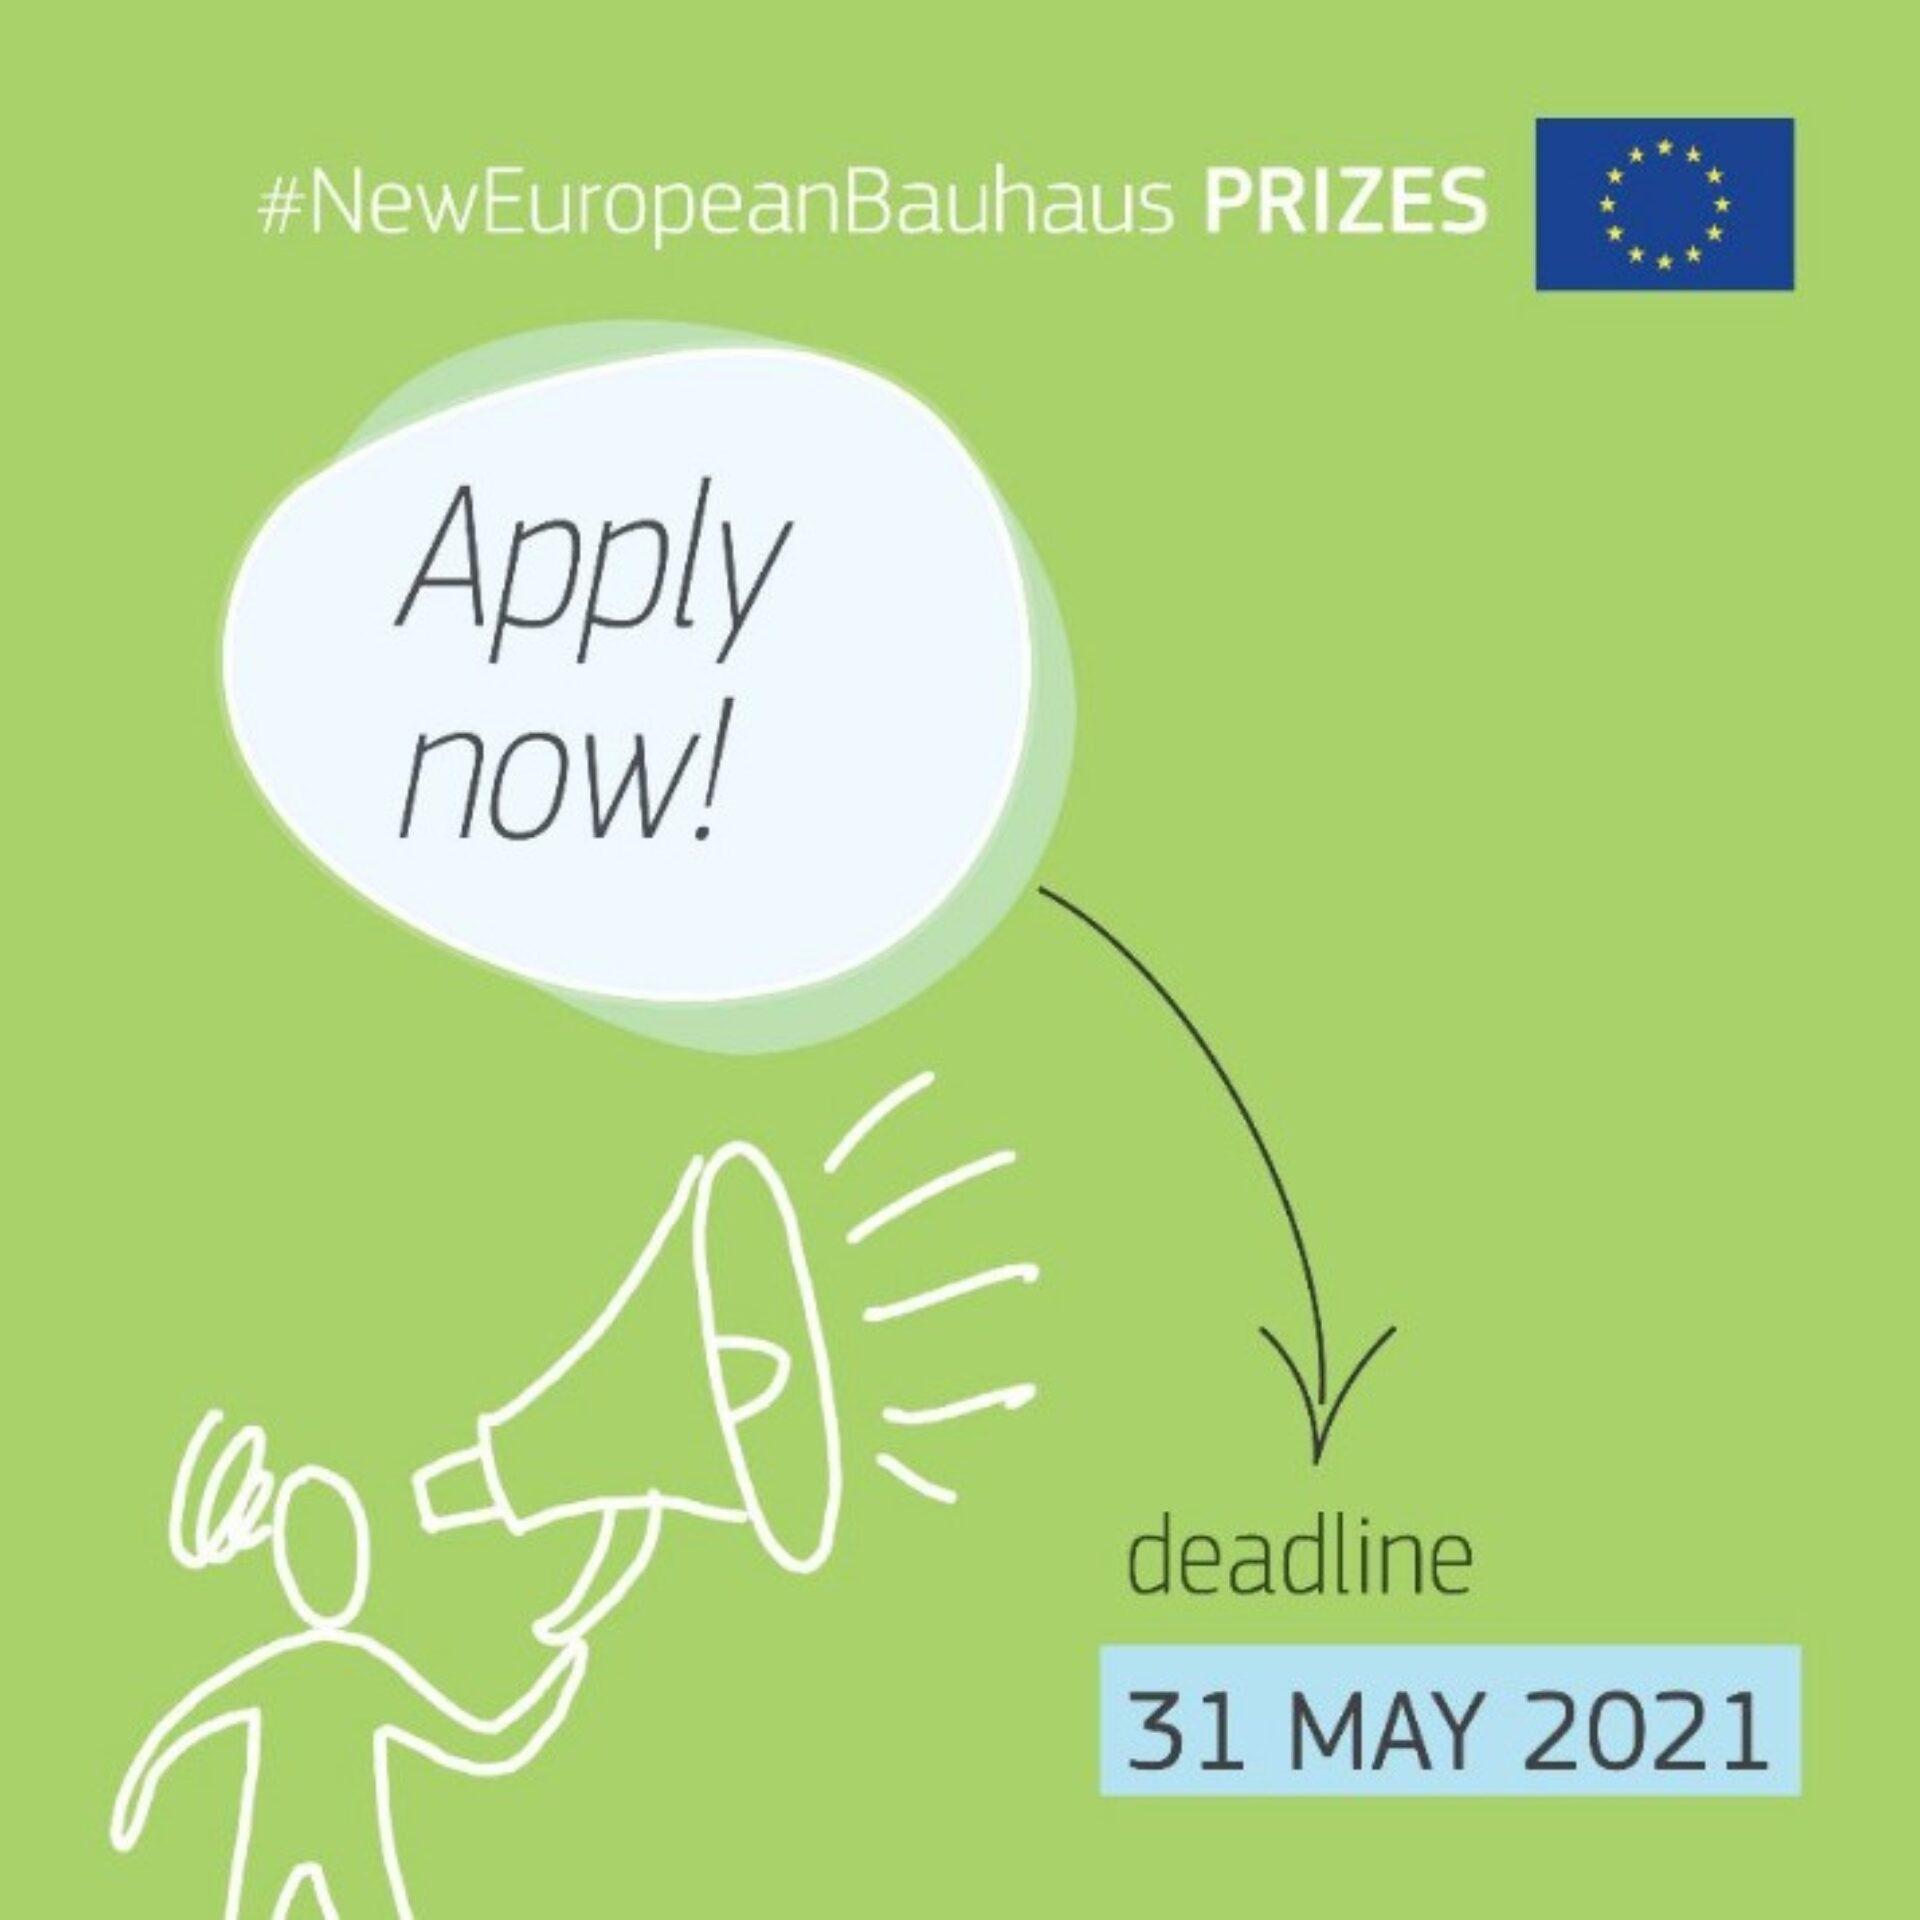 Razpis za nagrade New European Bauhaus 2021